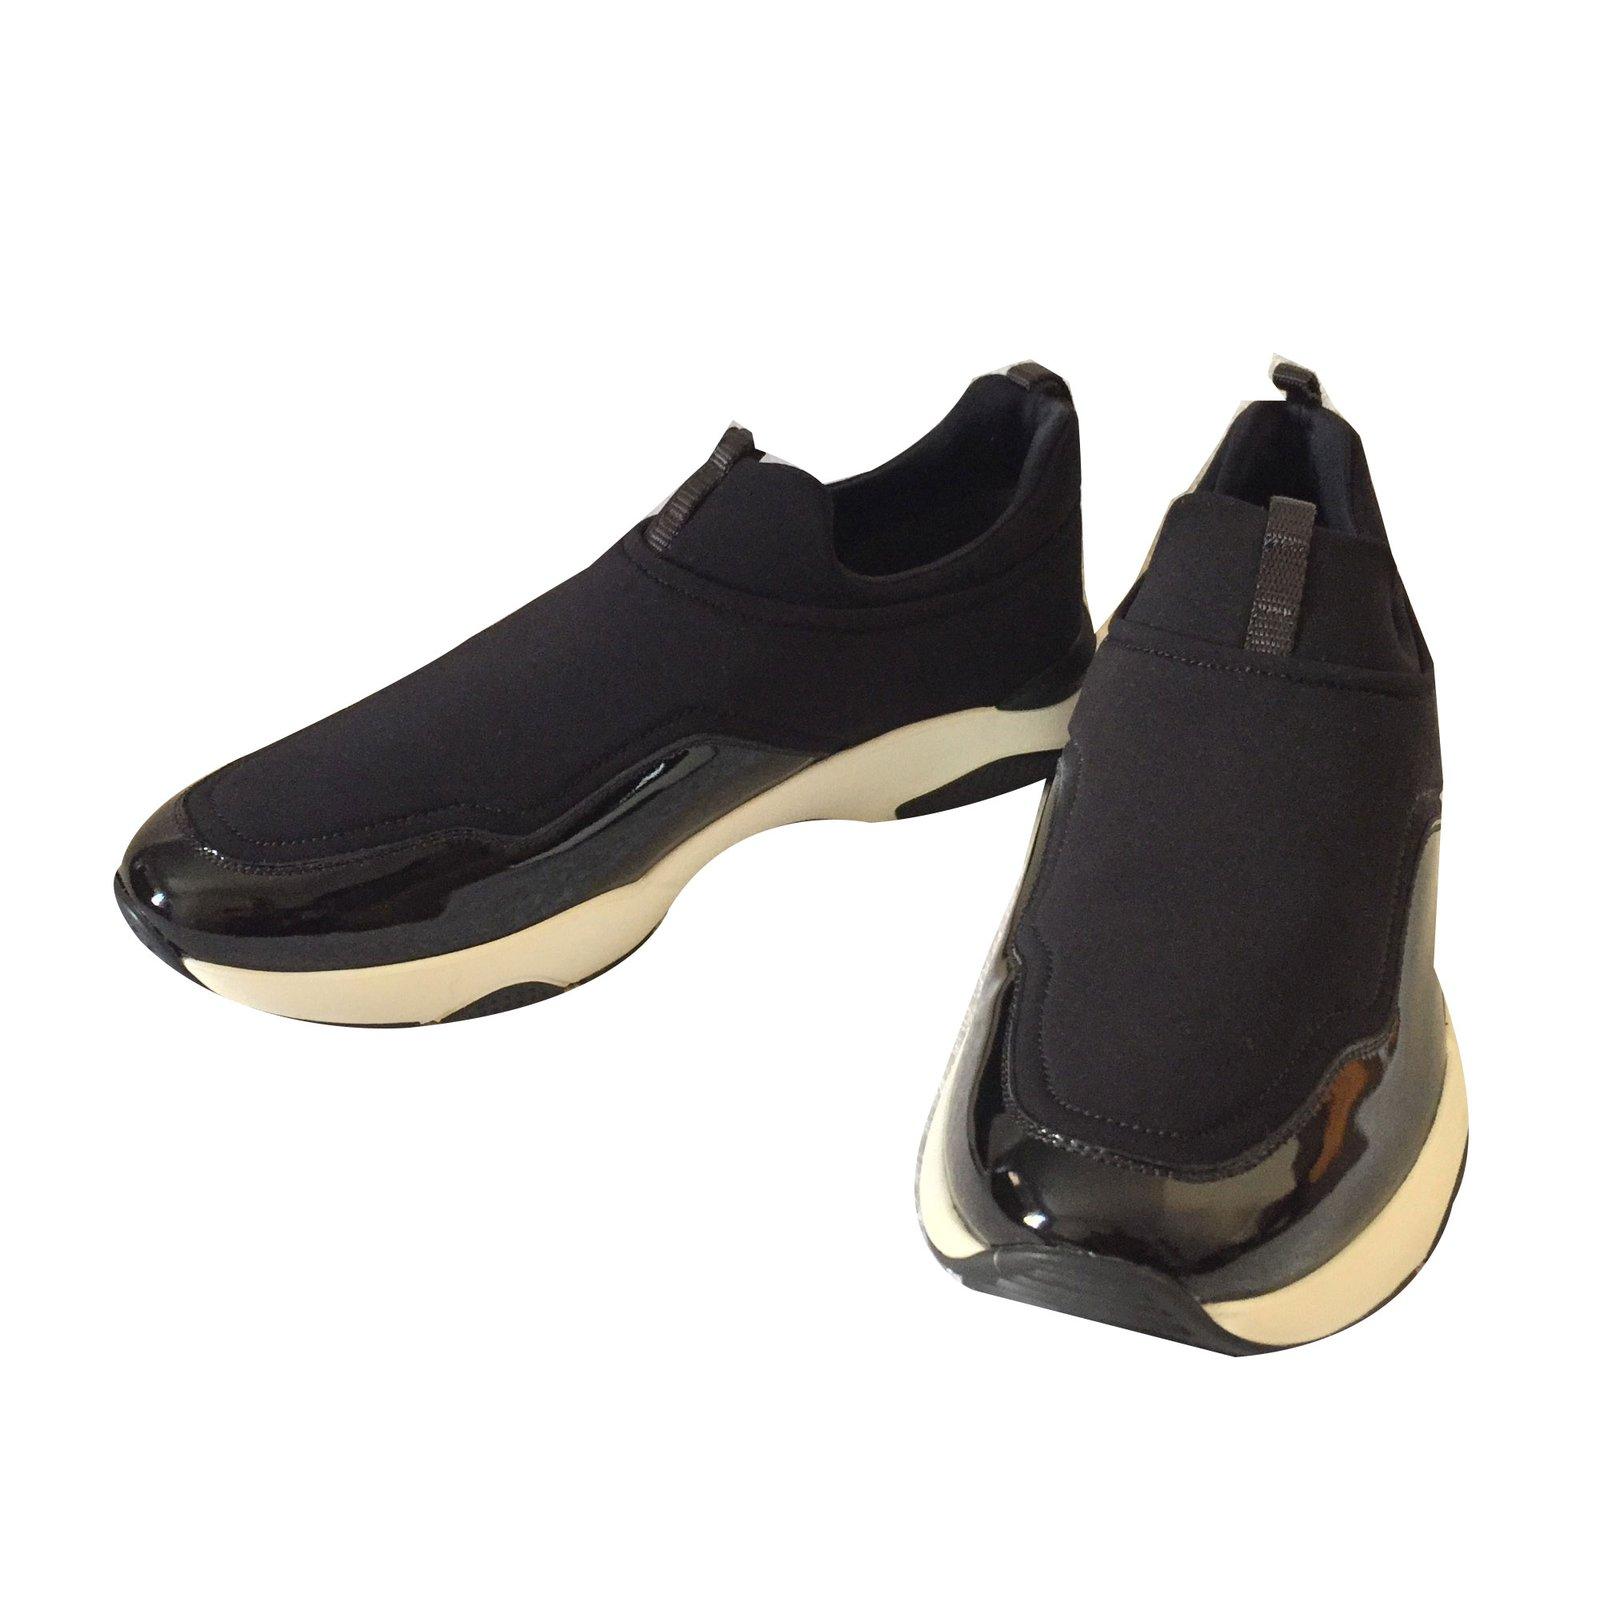 Sneakers Salvatore Ferragamo for Men